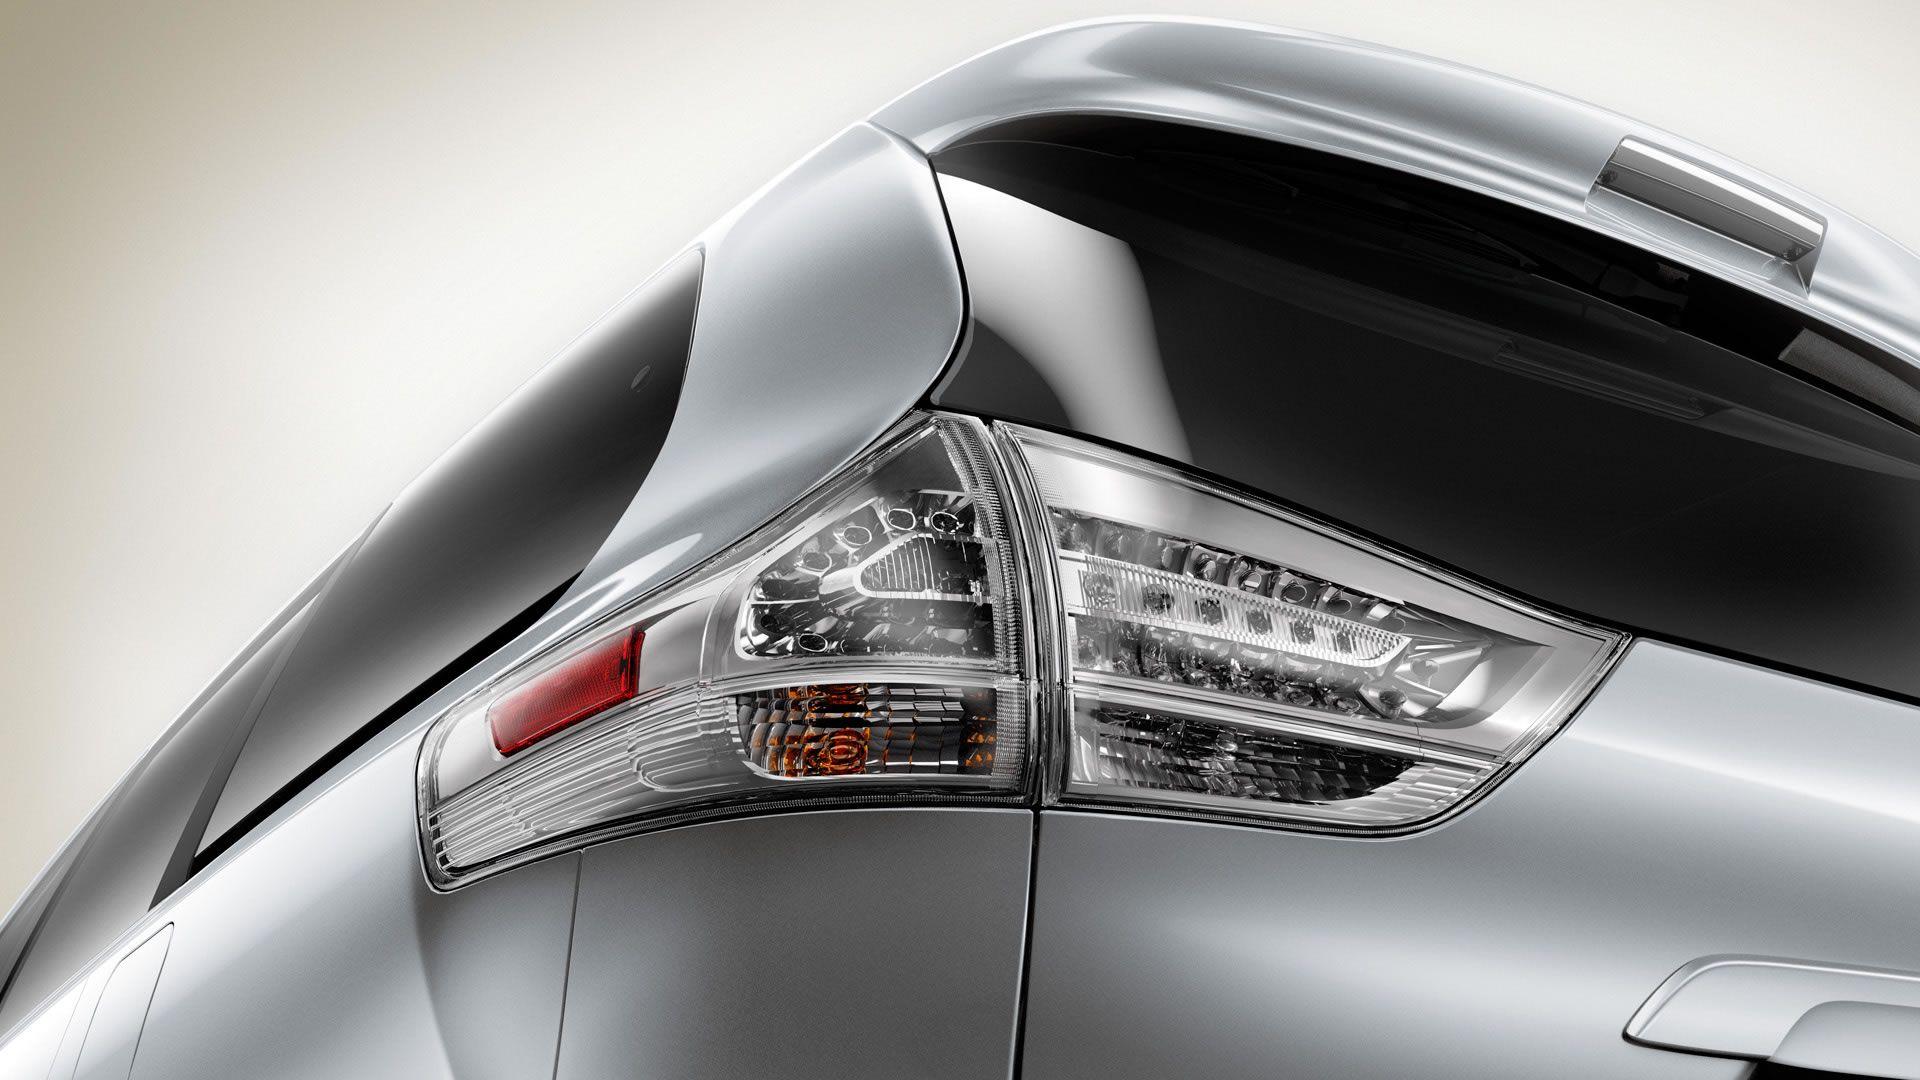 Modern exterior design Toyota dealers, Toyota, Toyota sienna